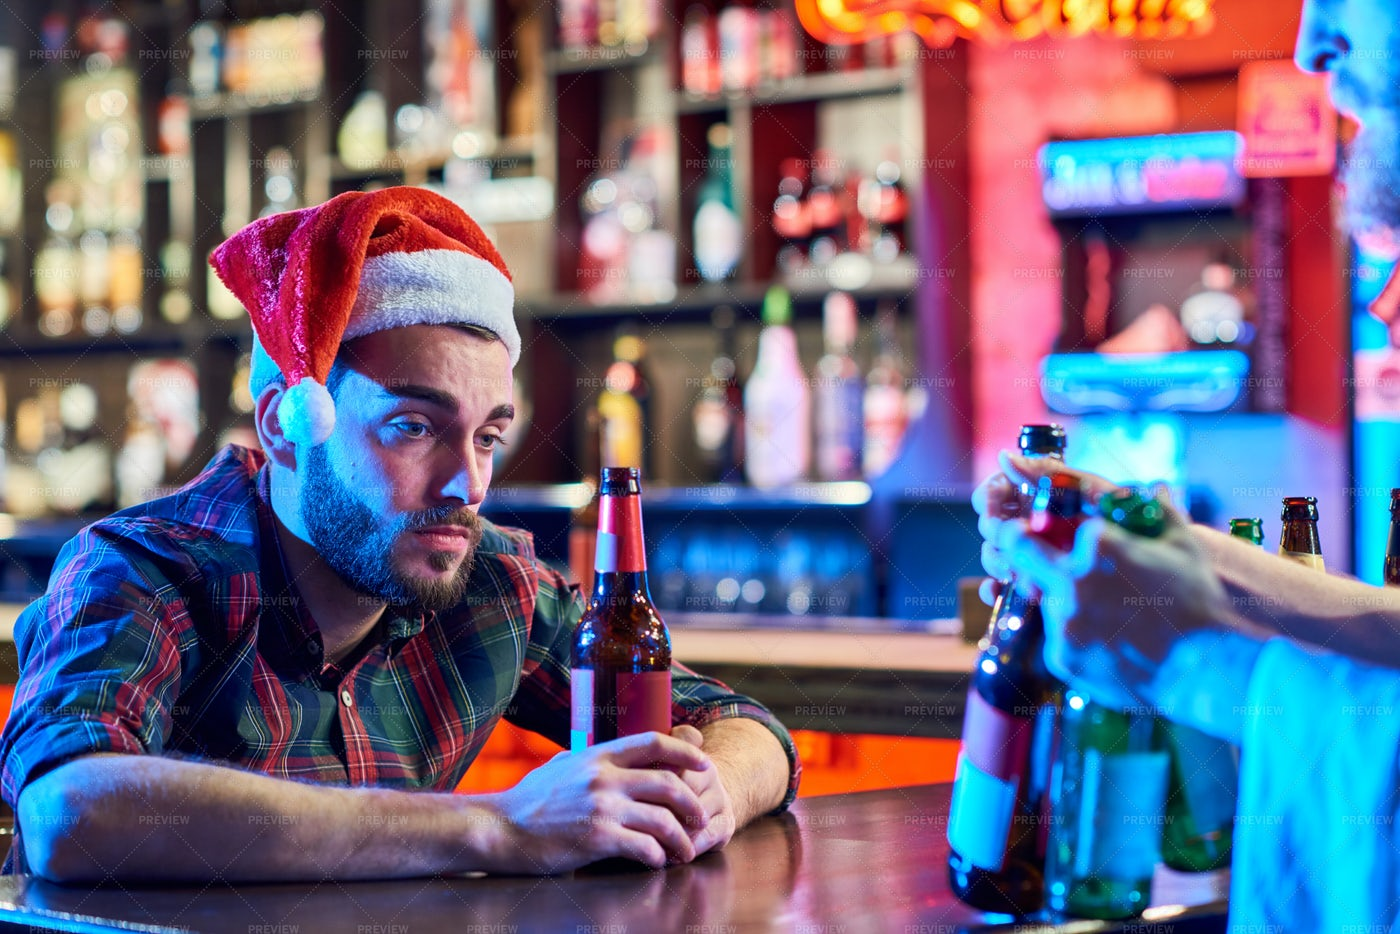 Drunk Man Alone On Christmas: Stock Photos